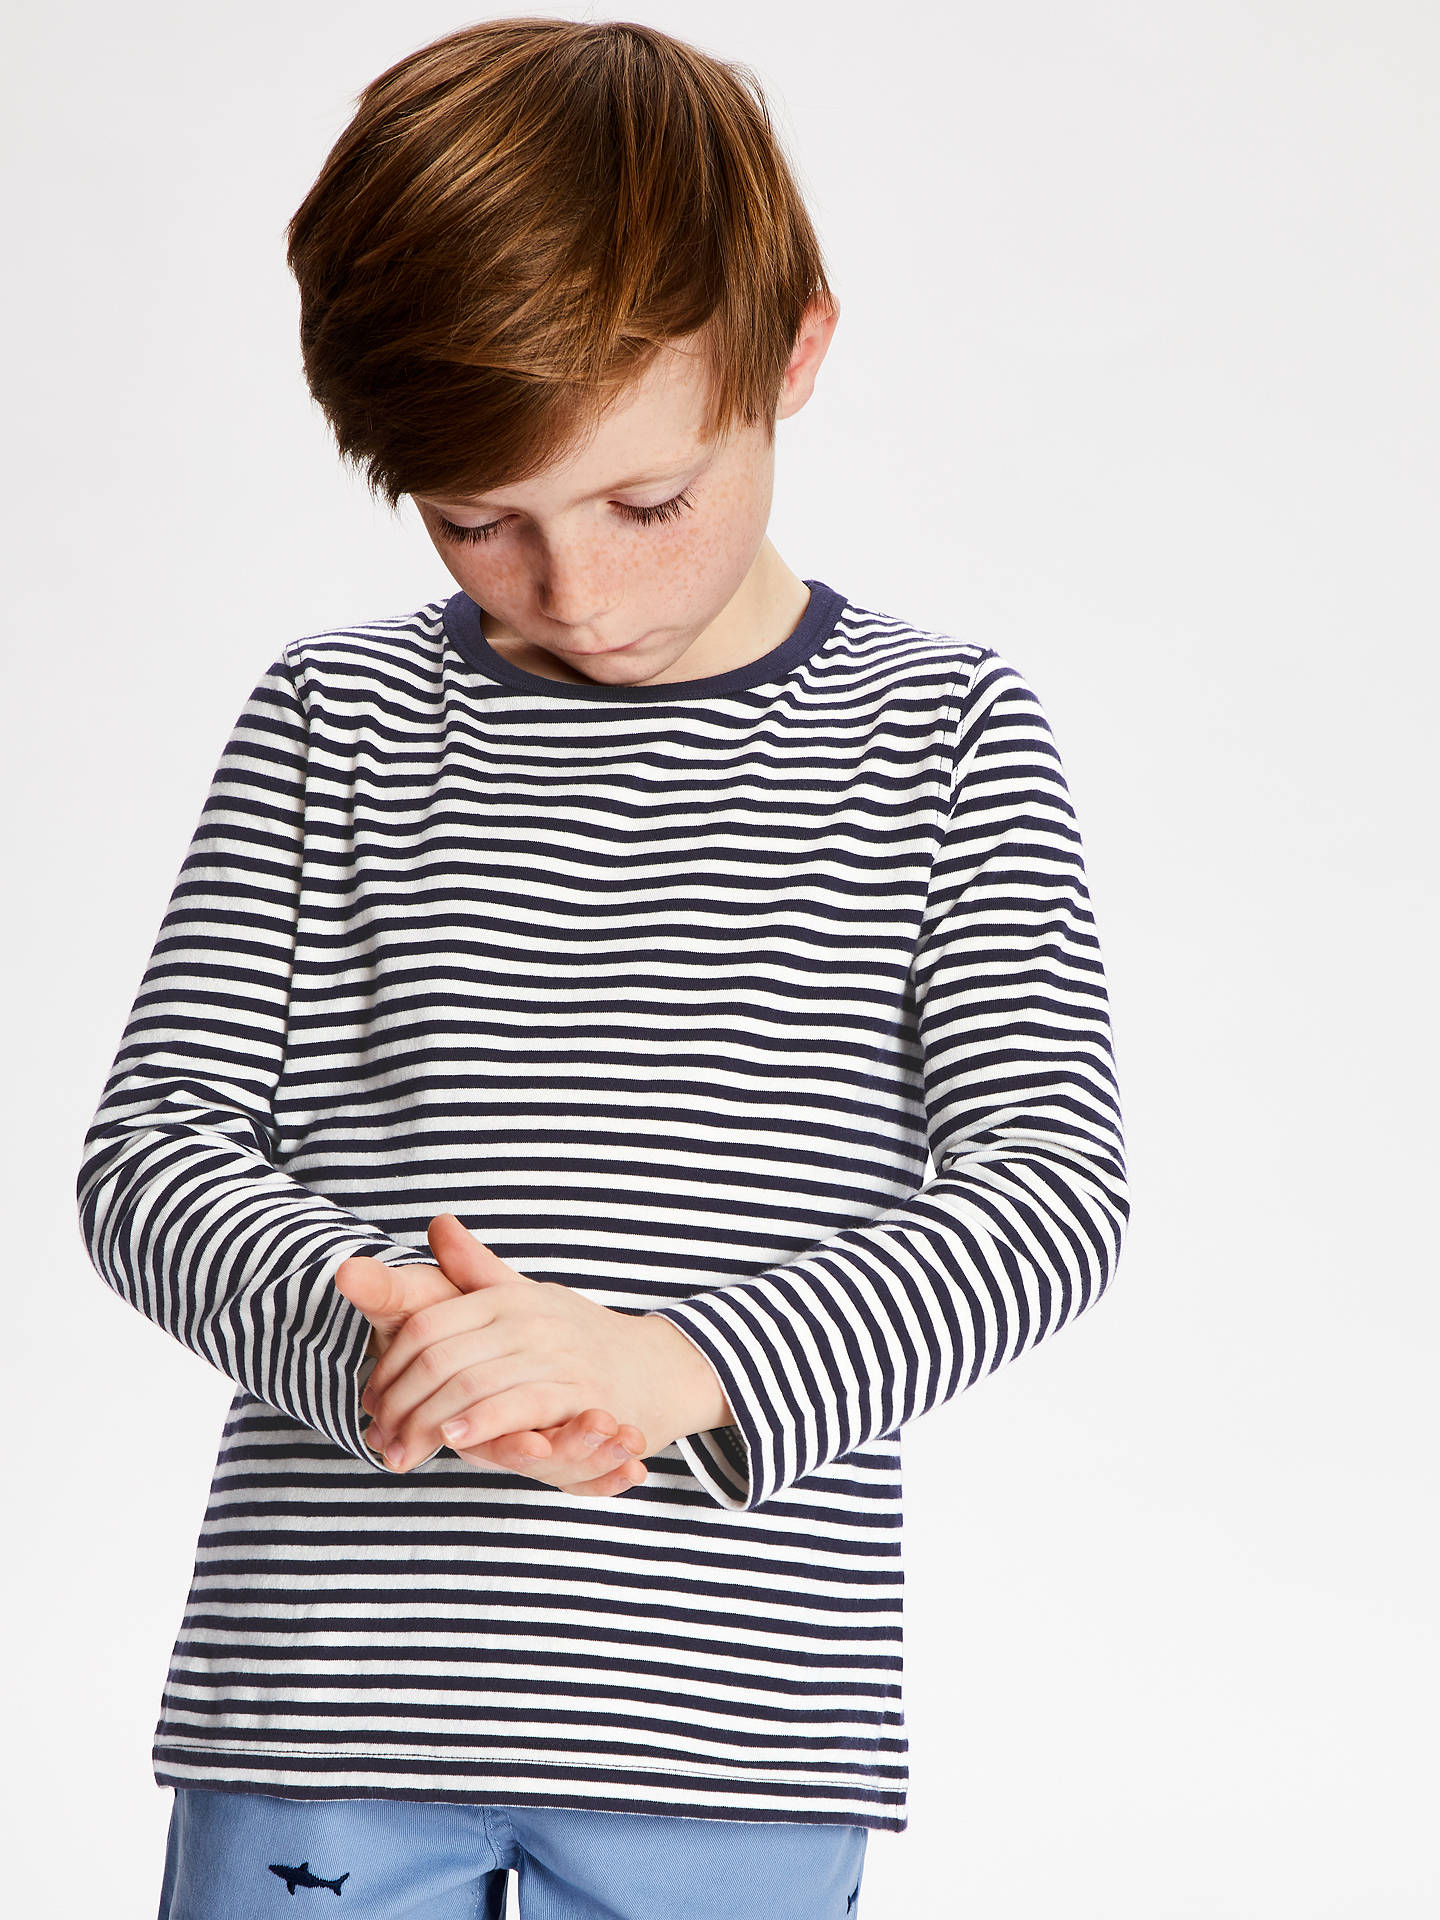 1ccdca581 Buy John Lewis   Partners Boys  T-Shirts